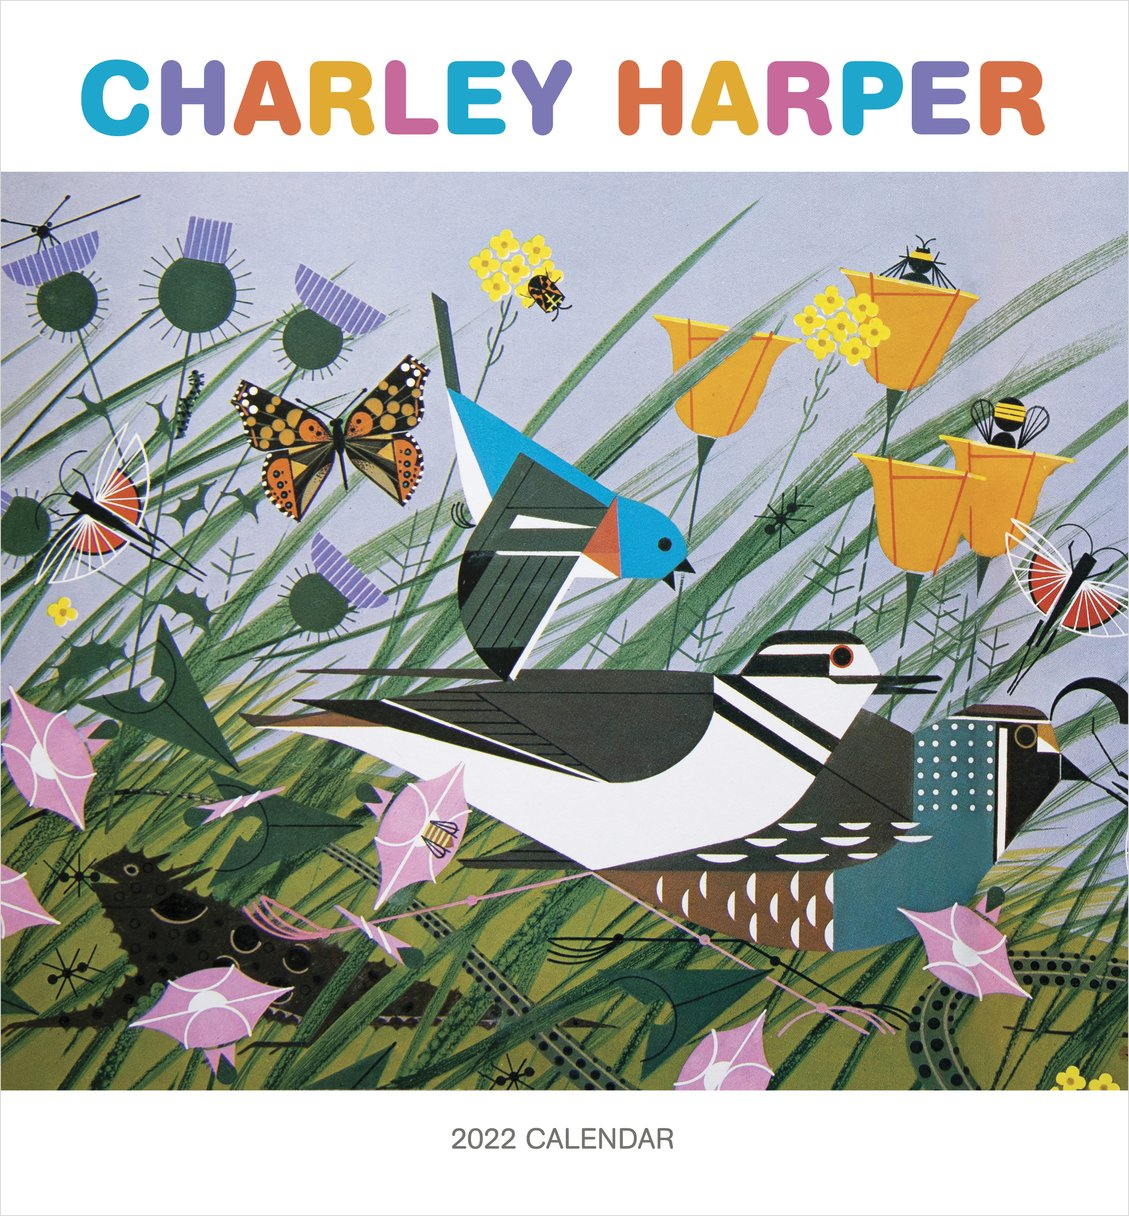 Charley Harper 2022 Calendar